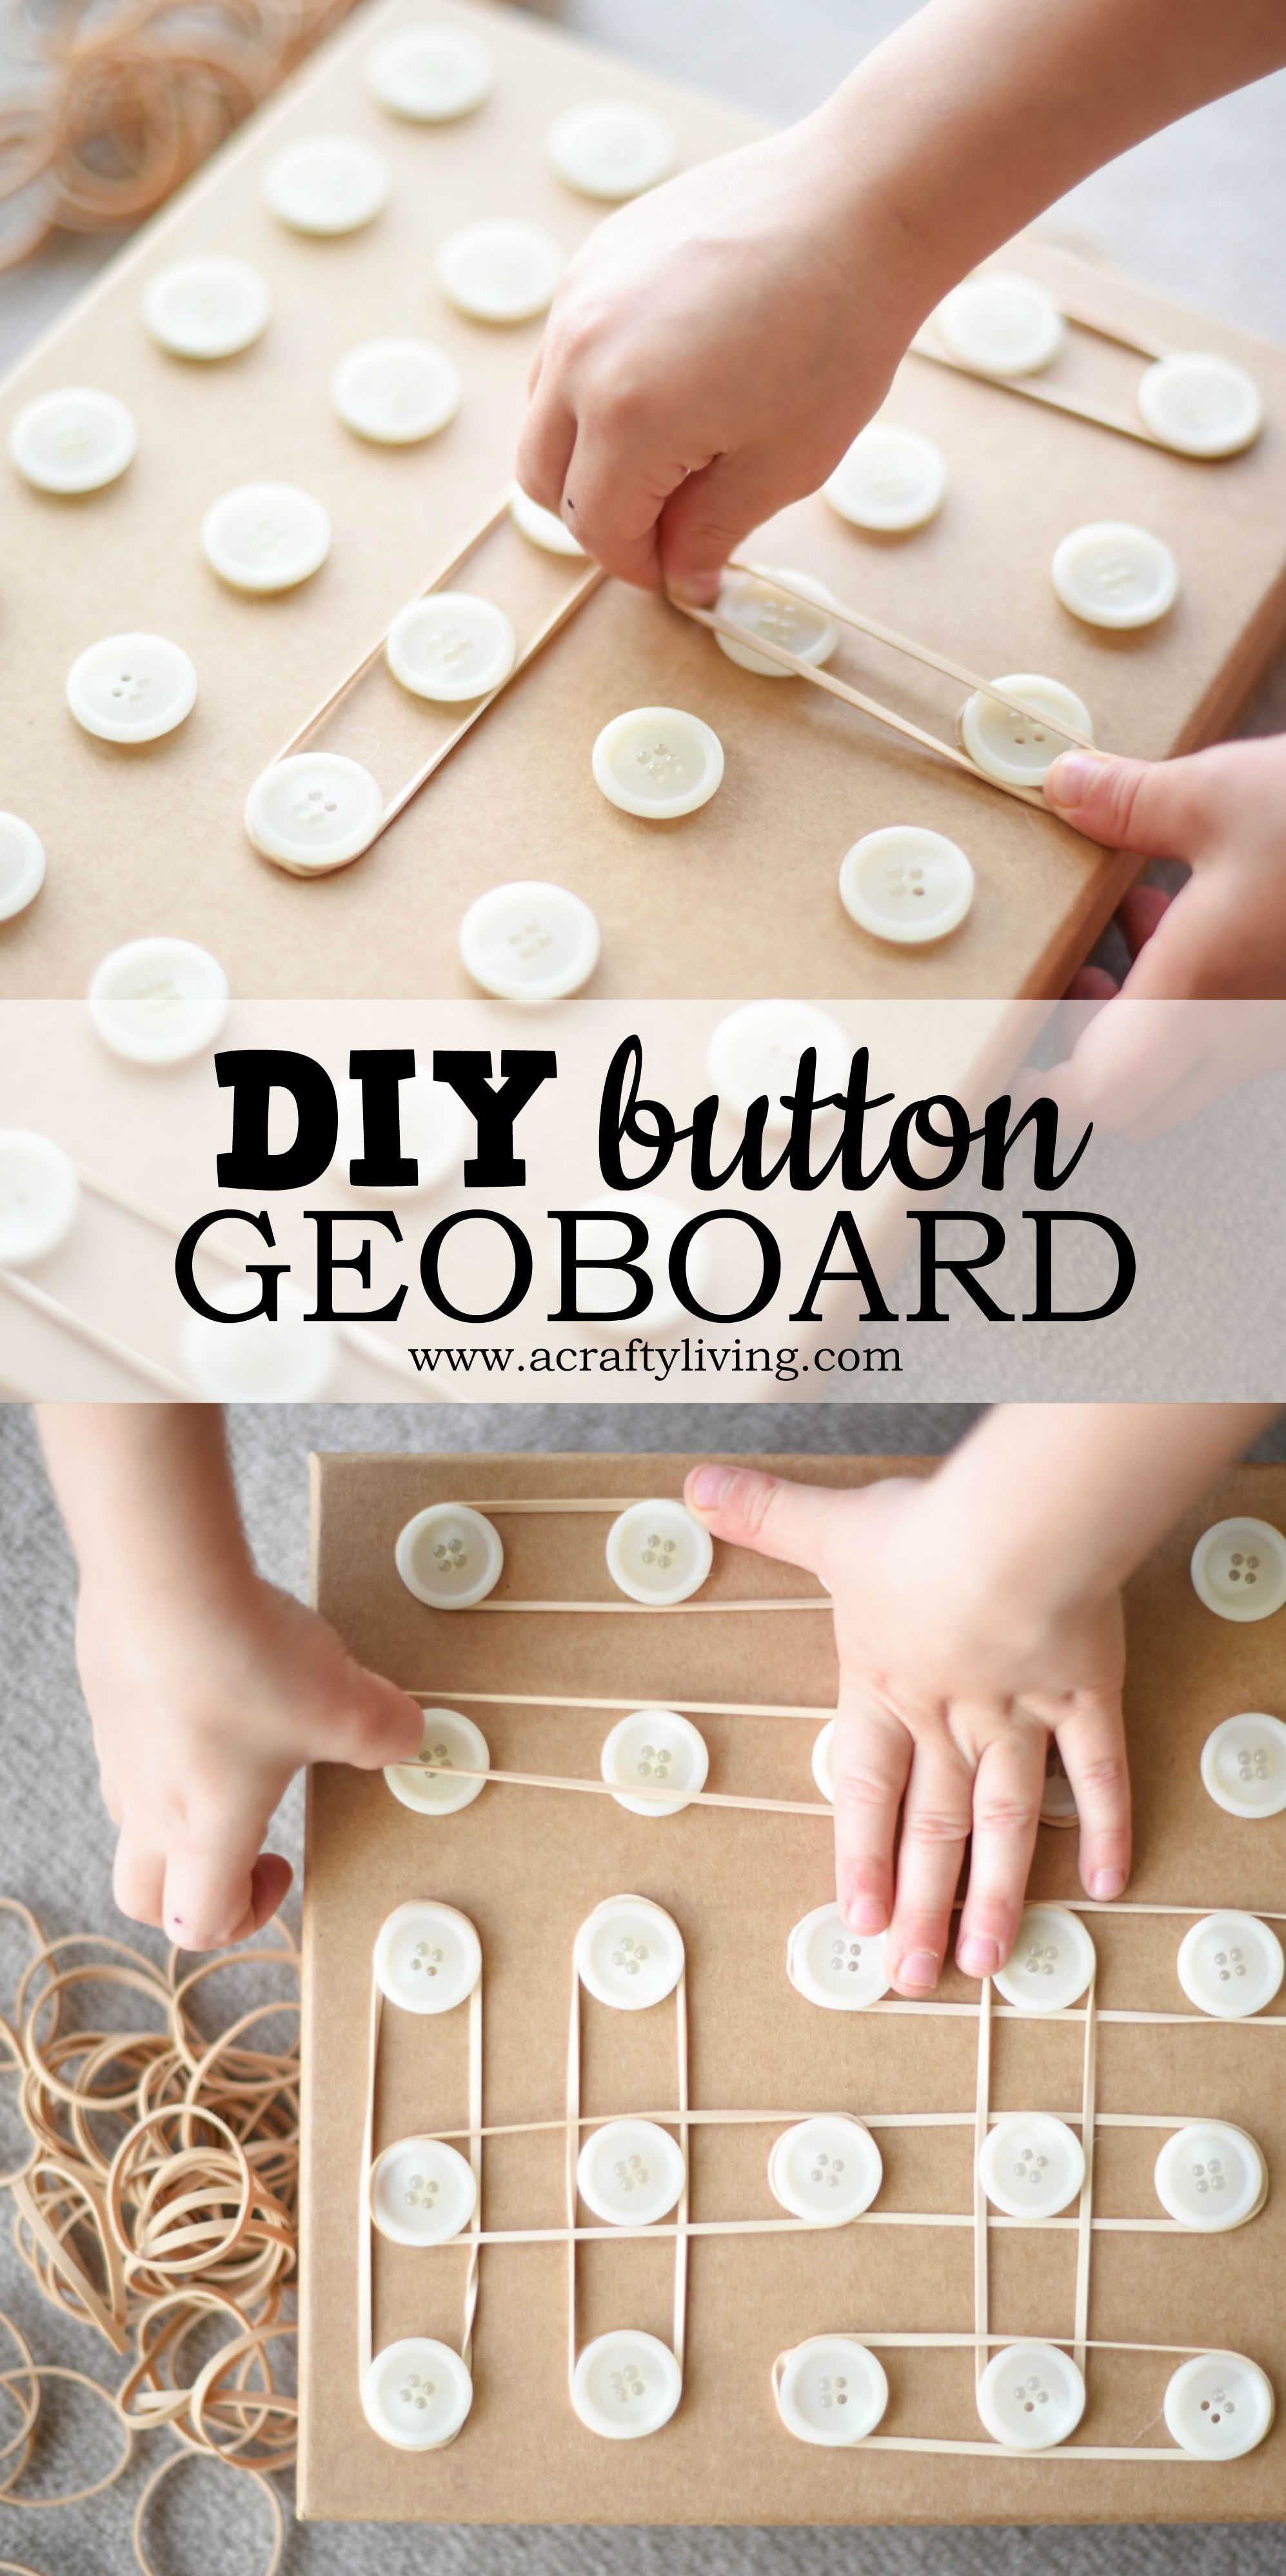 Diy Button Geoboard For Preschoolers Raftyliving